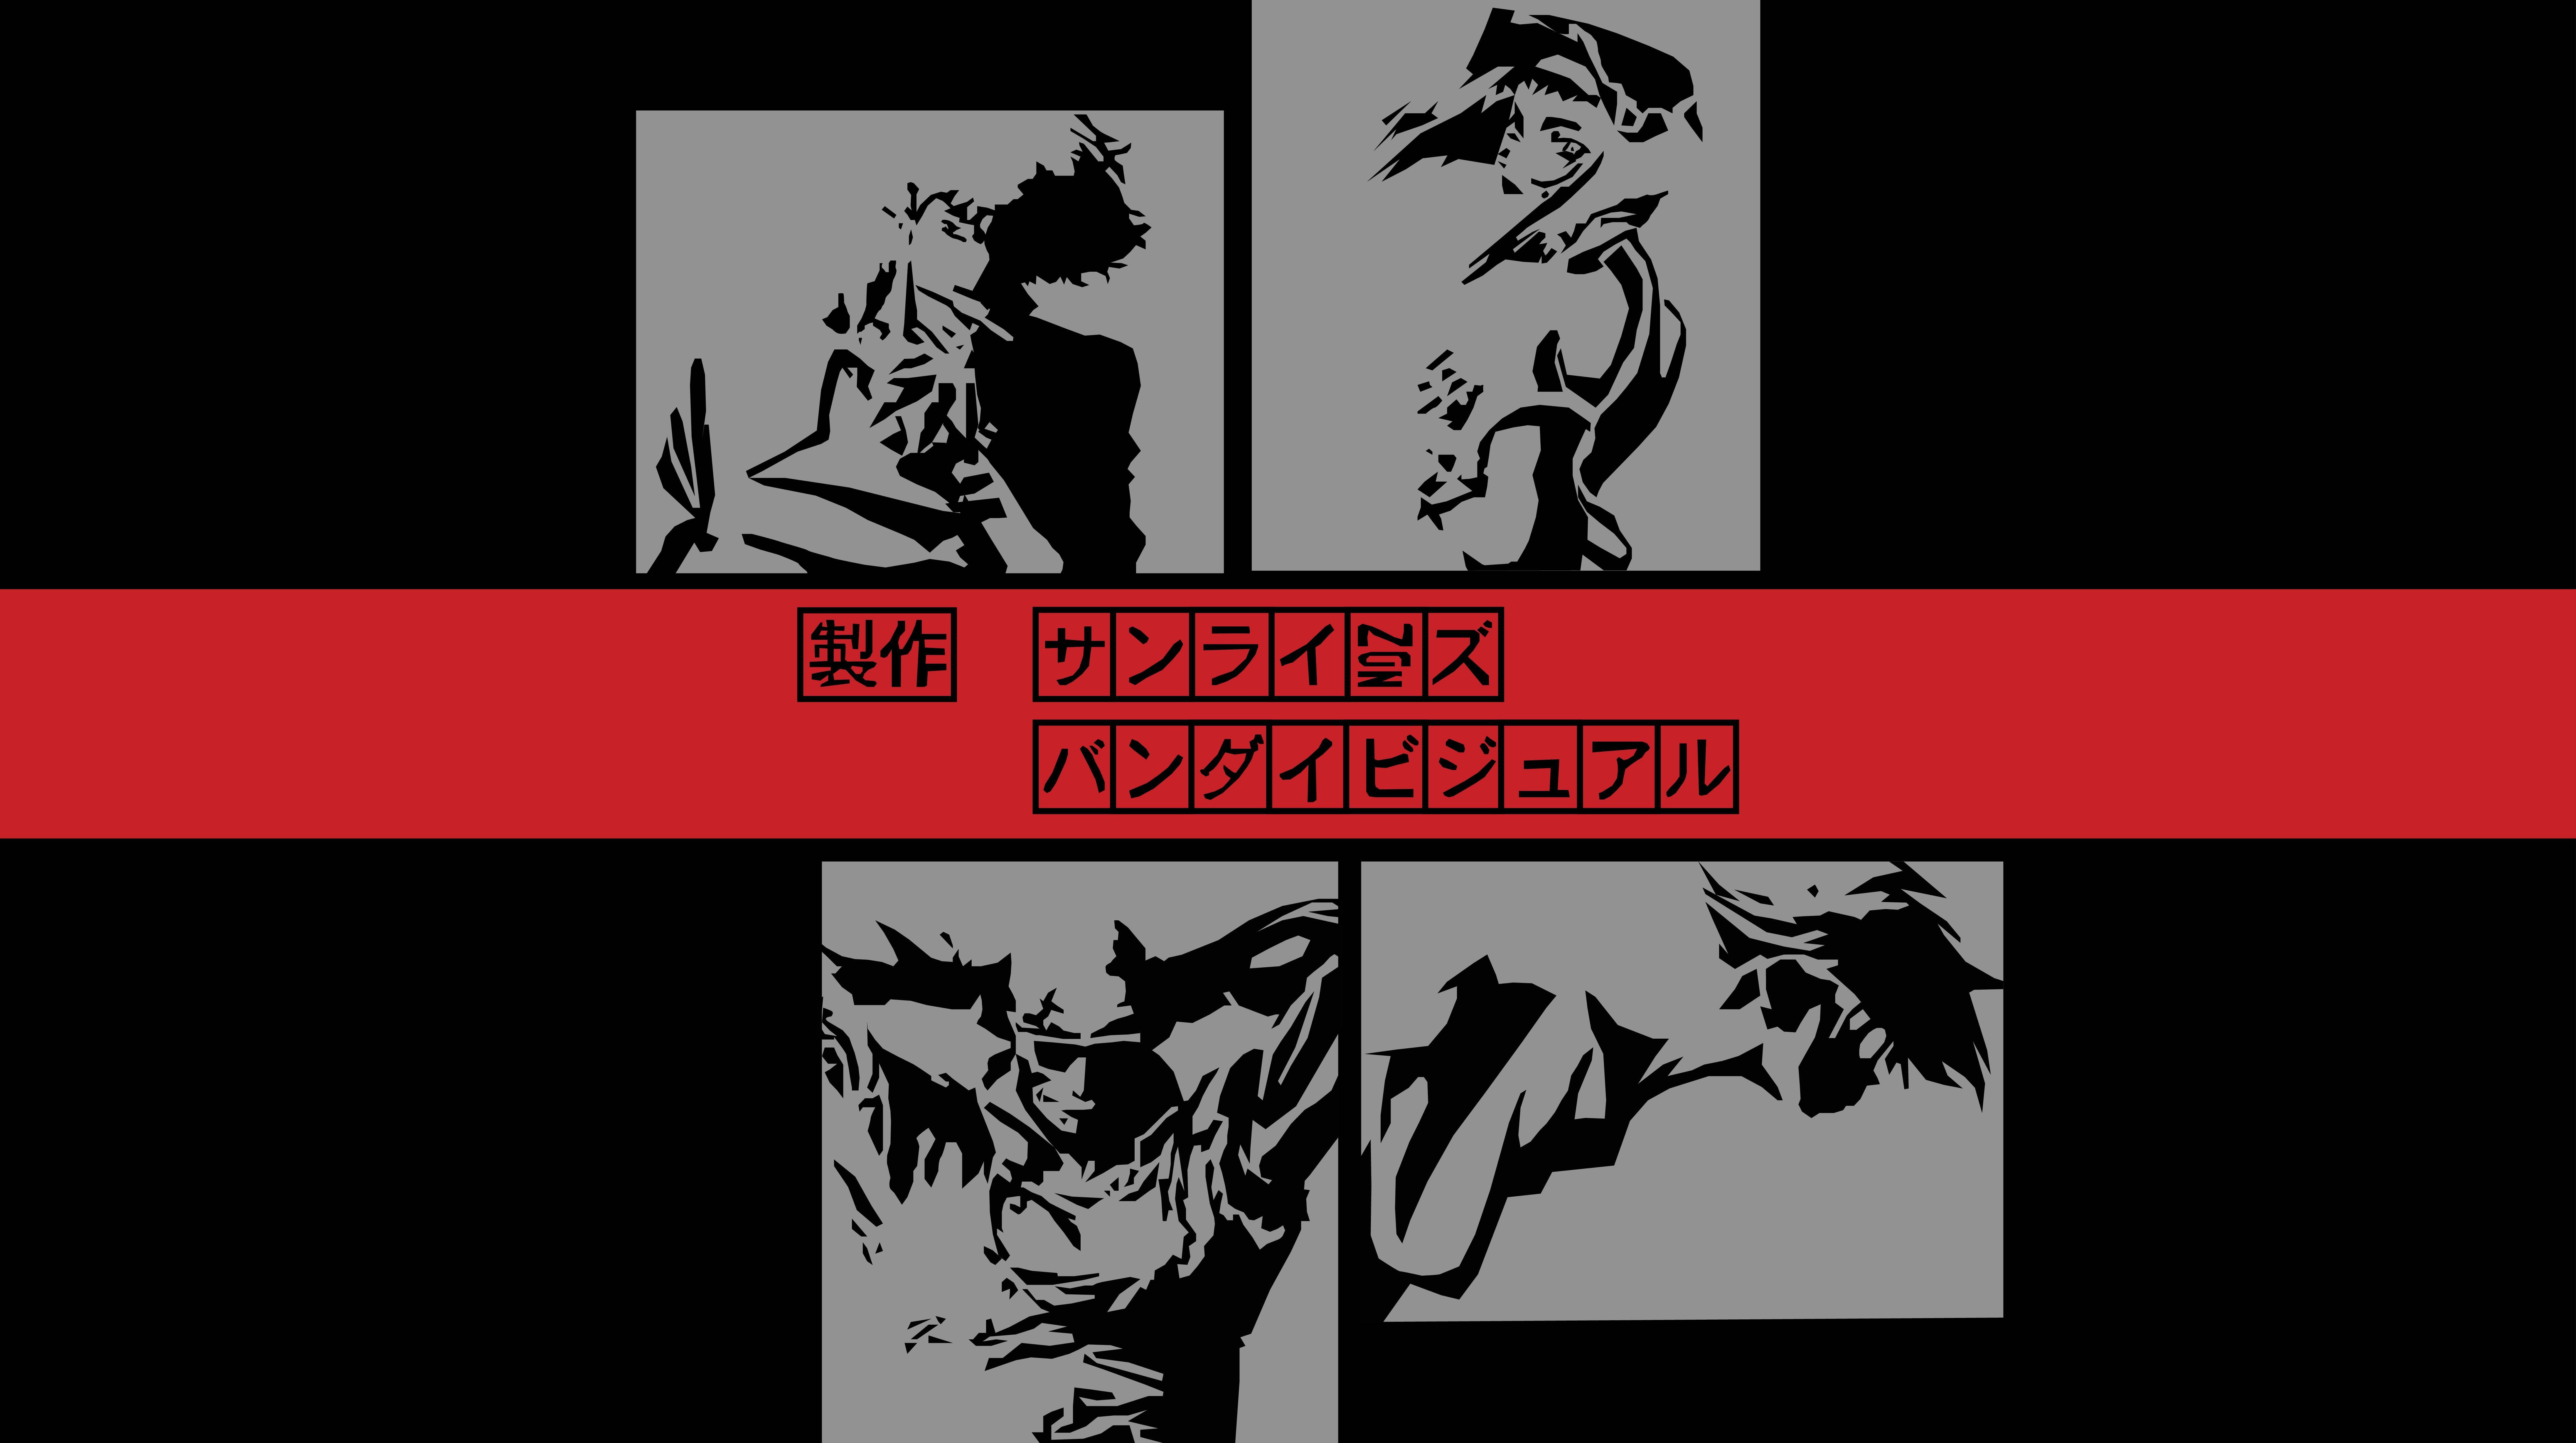 Cowboy Bebop Cowboy Bebop Wallpapers Cowboy Bebop Cowboy Bebop Anime